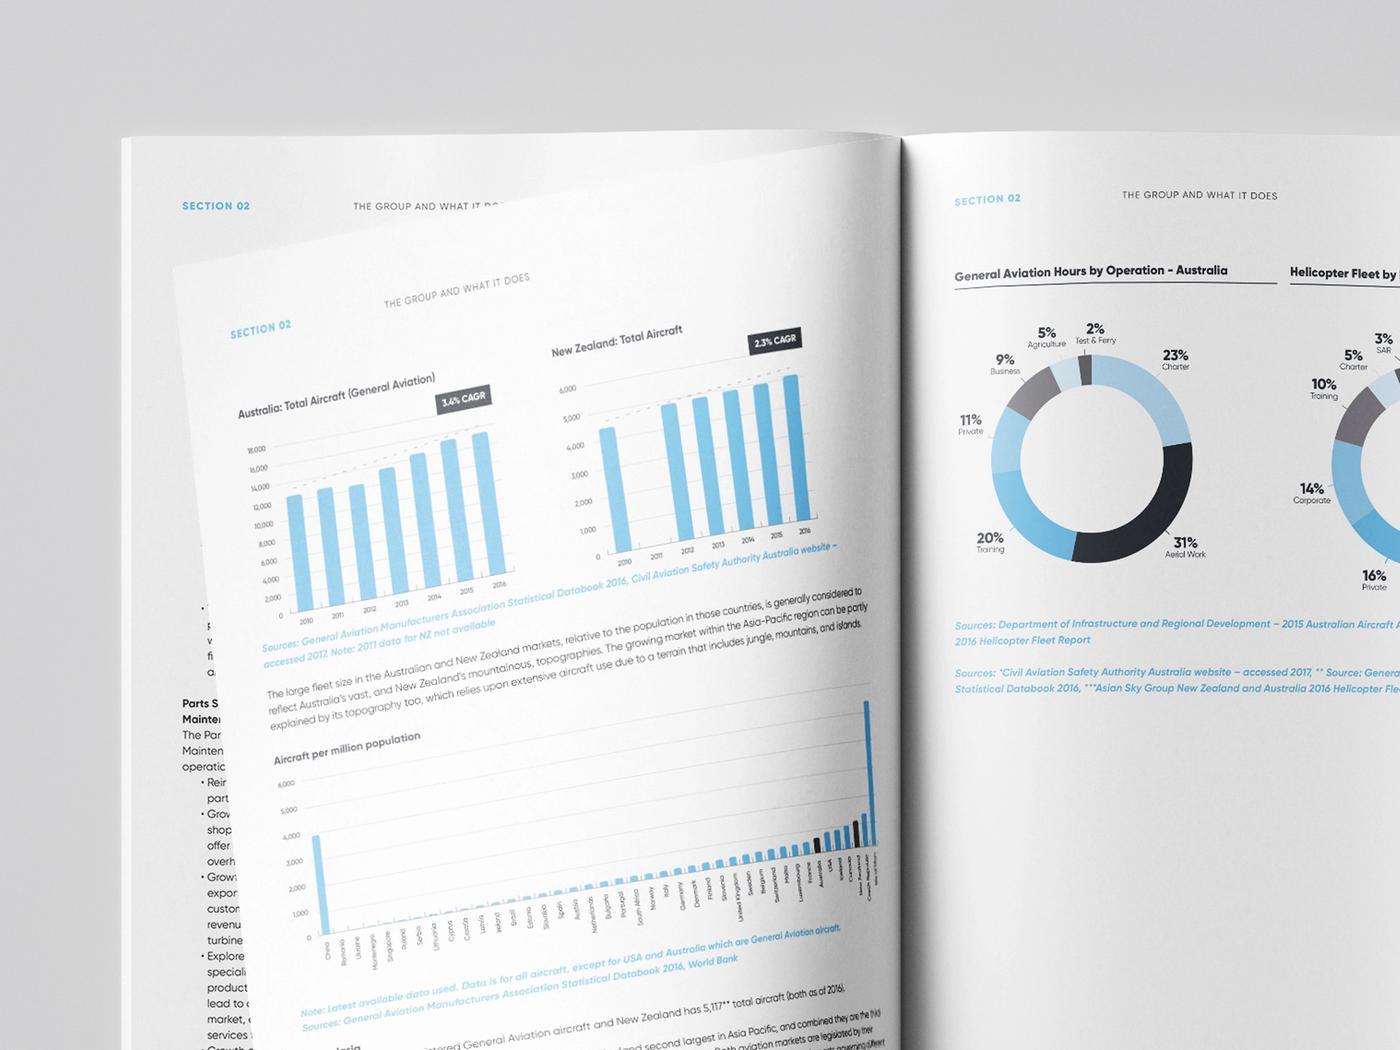 Salus Aviation product disclosure statement graphs